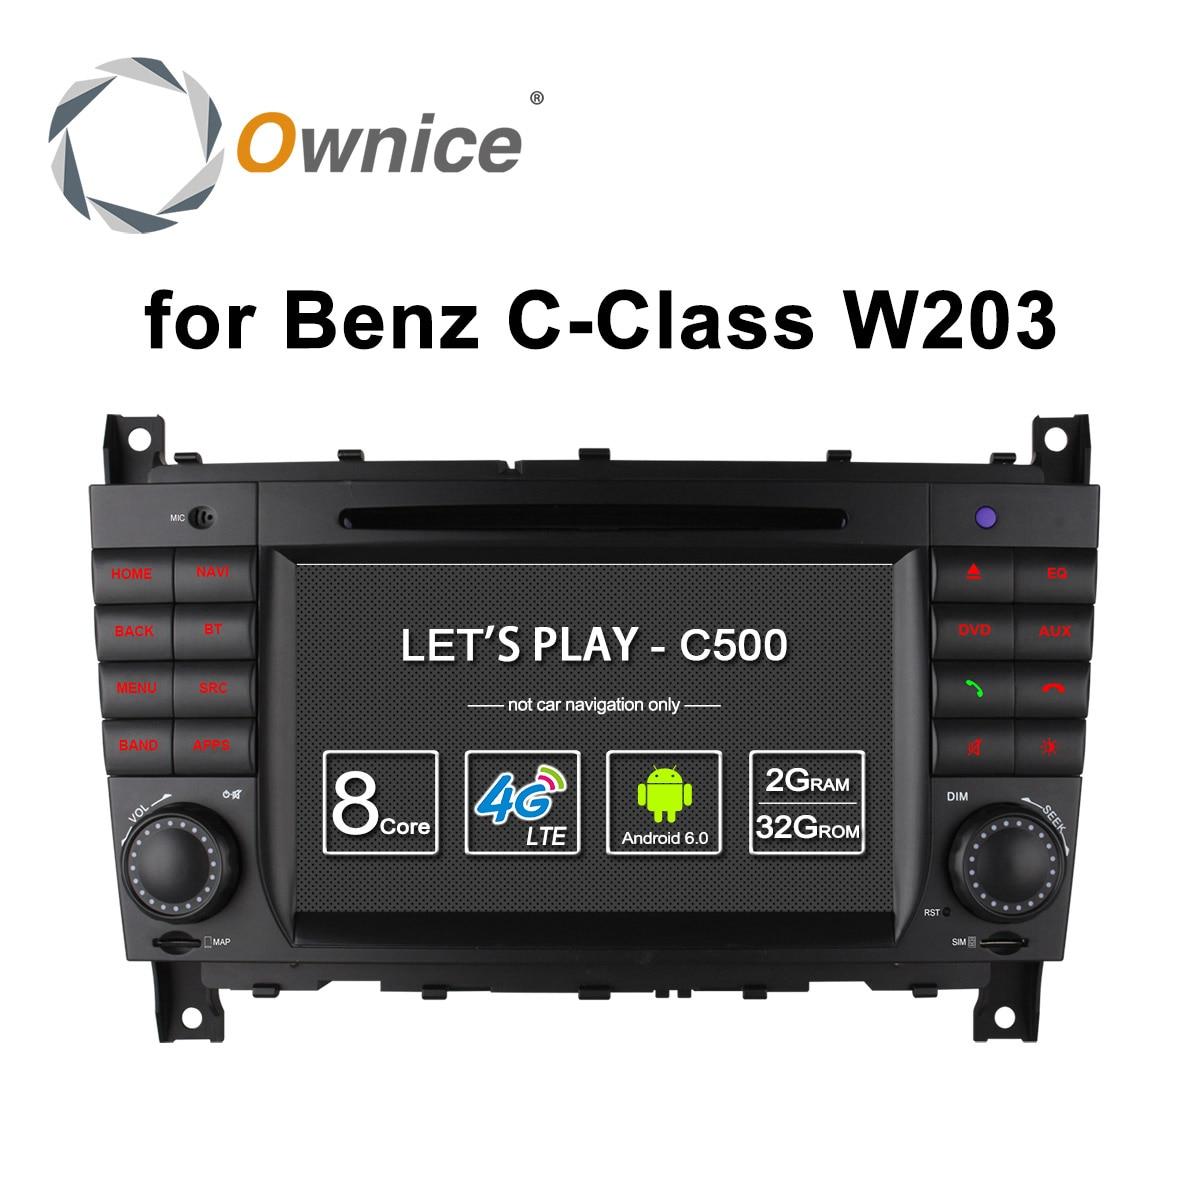 4G SIM LTE Android 6.0 Octa 8 Core Car DVD for Mercedes C Class W203 2004 - 2007 c200 C230 C240 C320 C350 CLK W209 2005 GPS